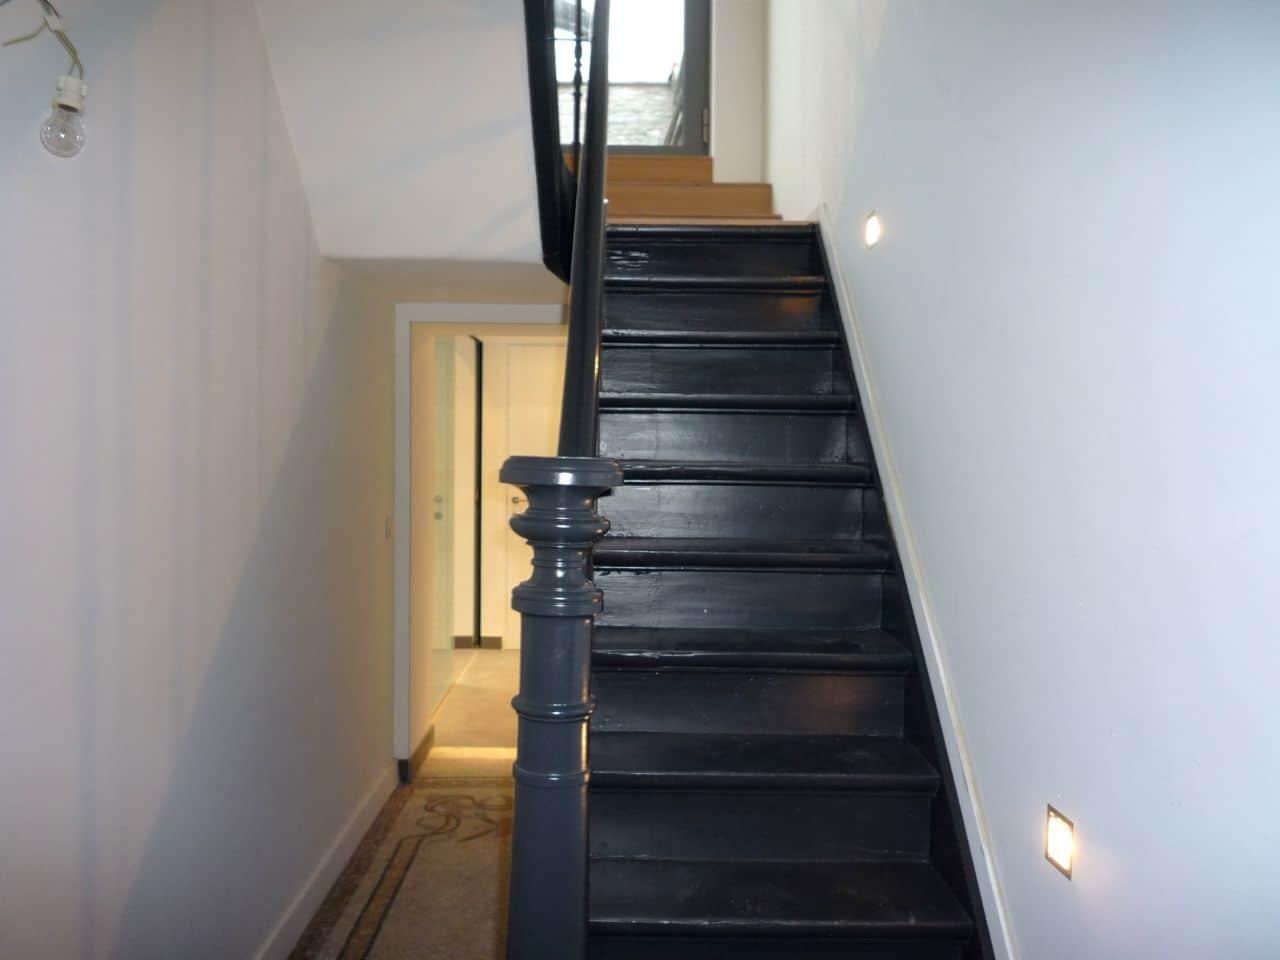 P1050546 | Baeyens & Beck architecten Gent | architect nieuwbouw renovatie interieur | high end | architectenbureau